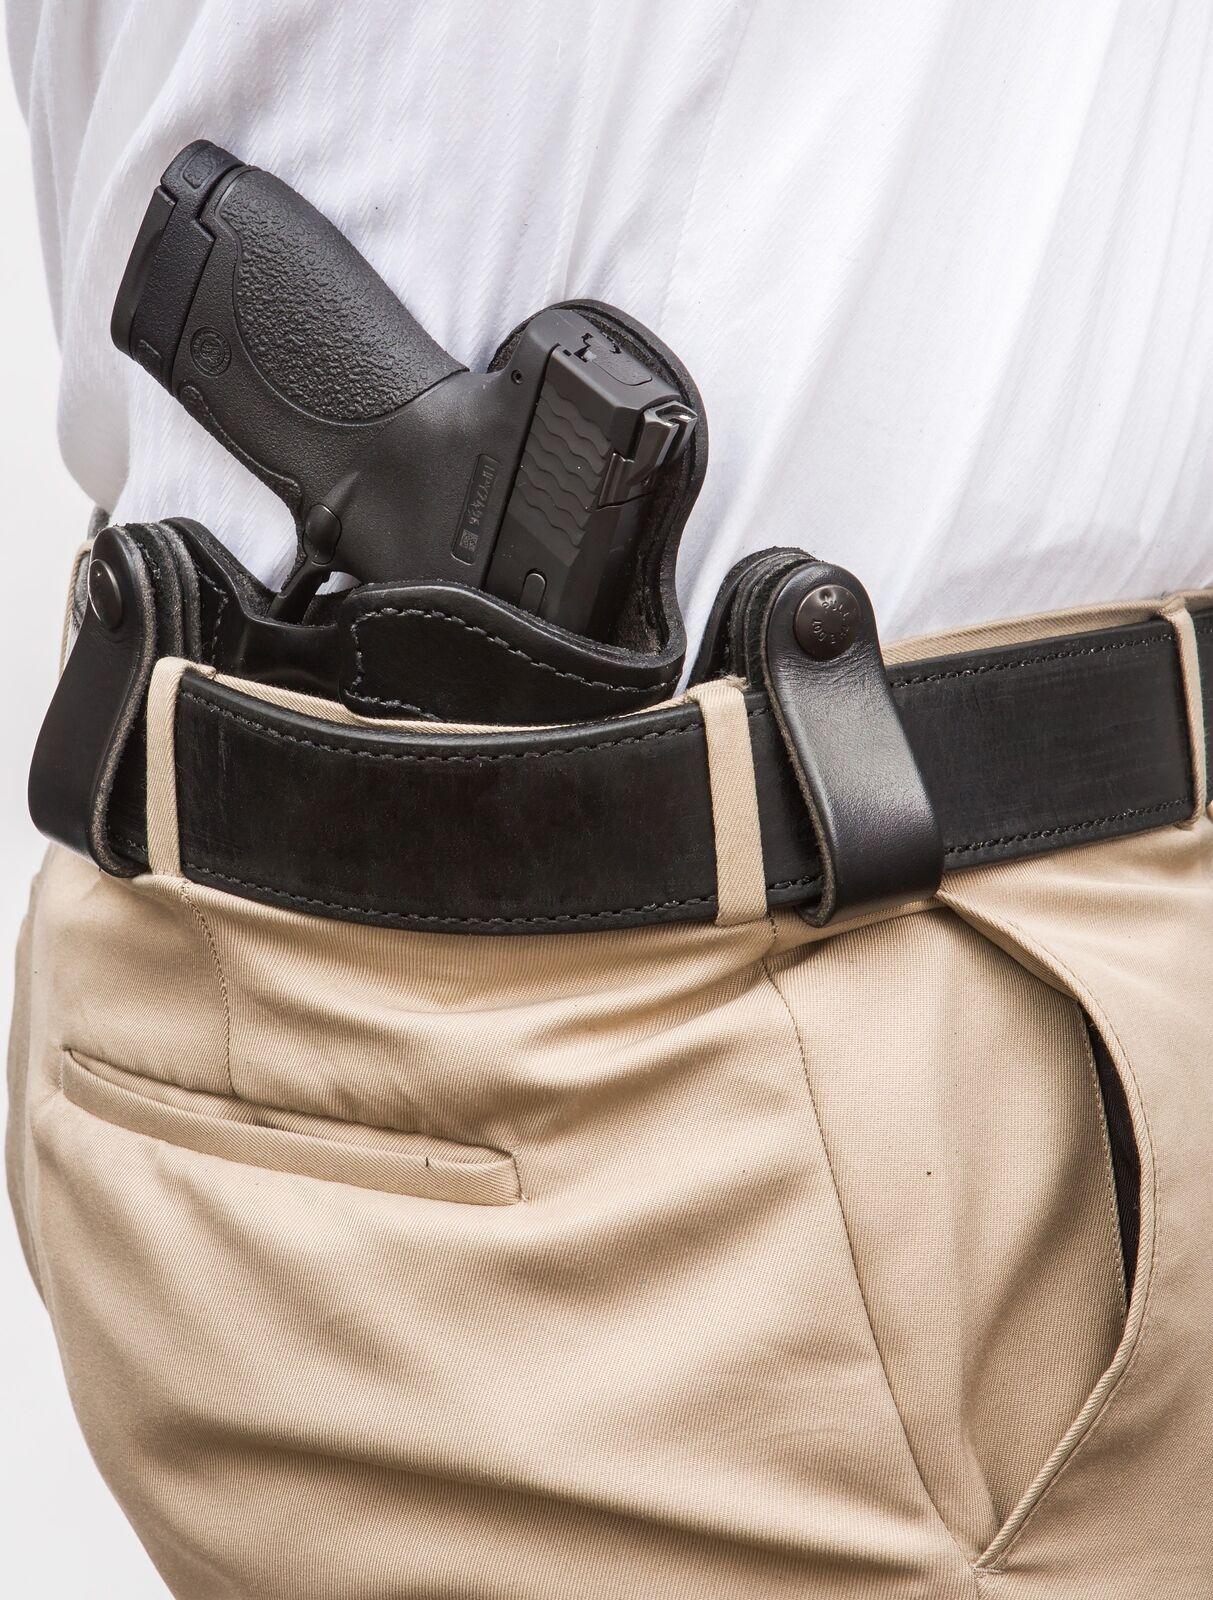 XTREME CARRY Dan RH LH IWB Leder Gun Holster For Dan CARRY Wesson 1911 5